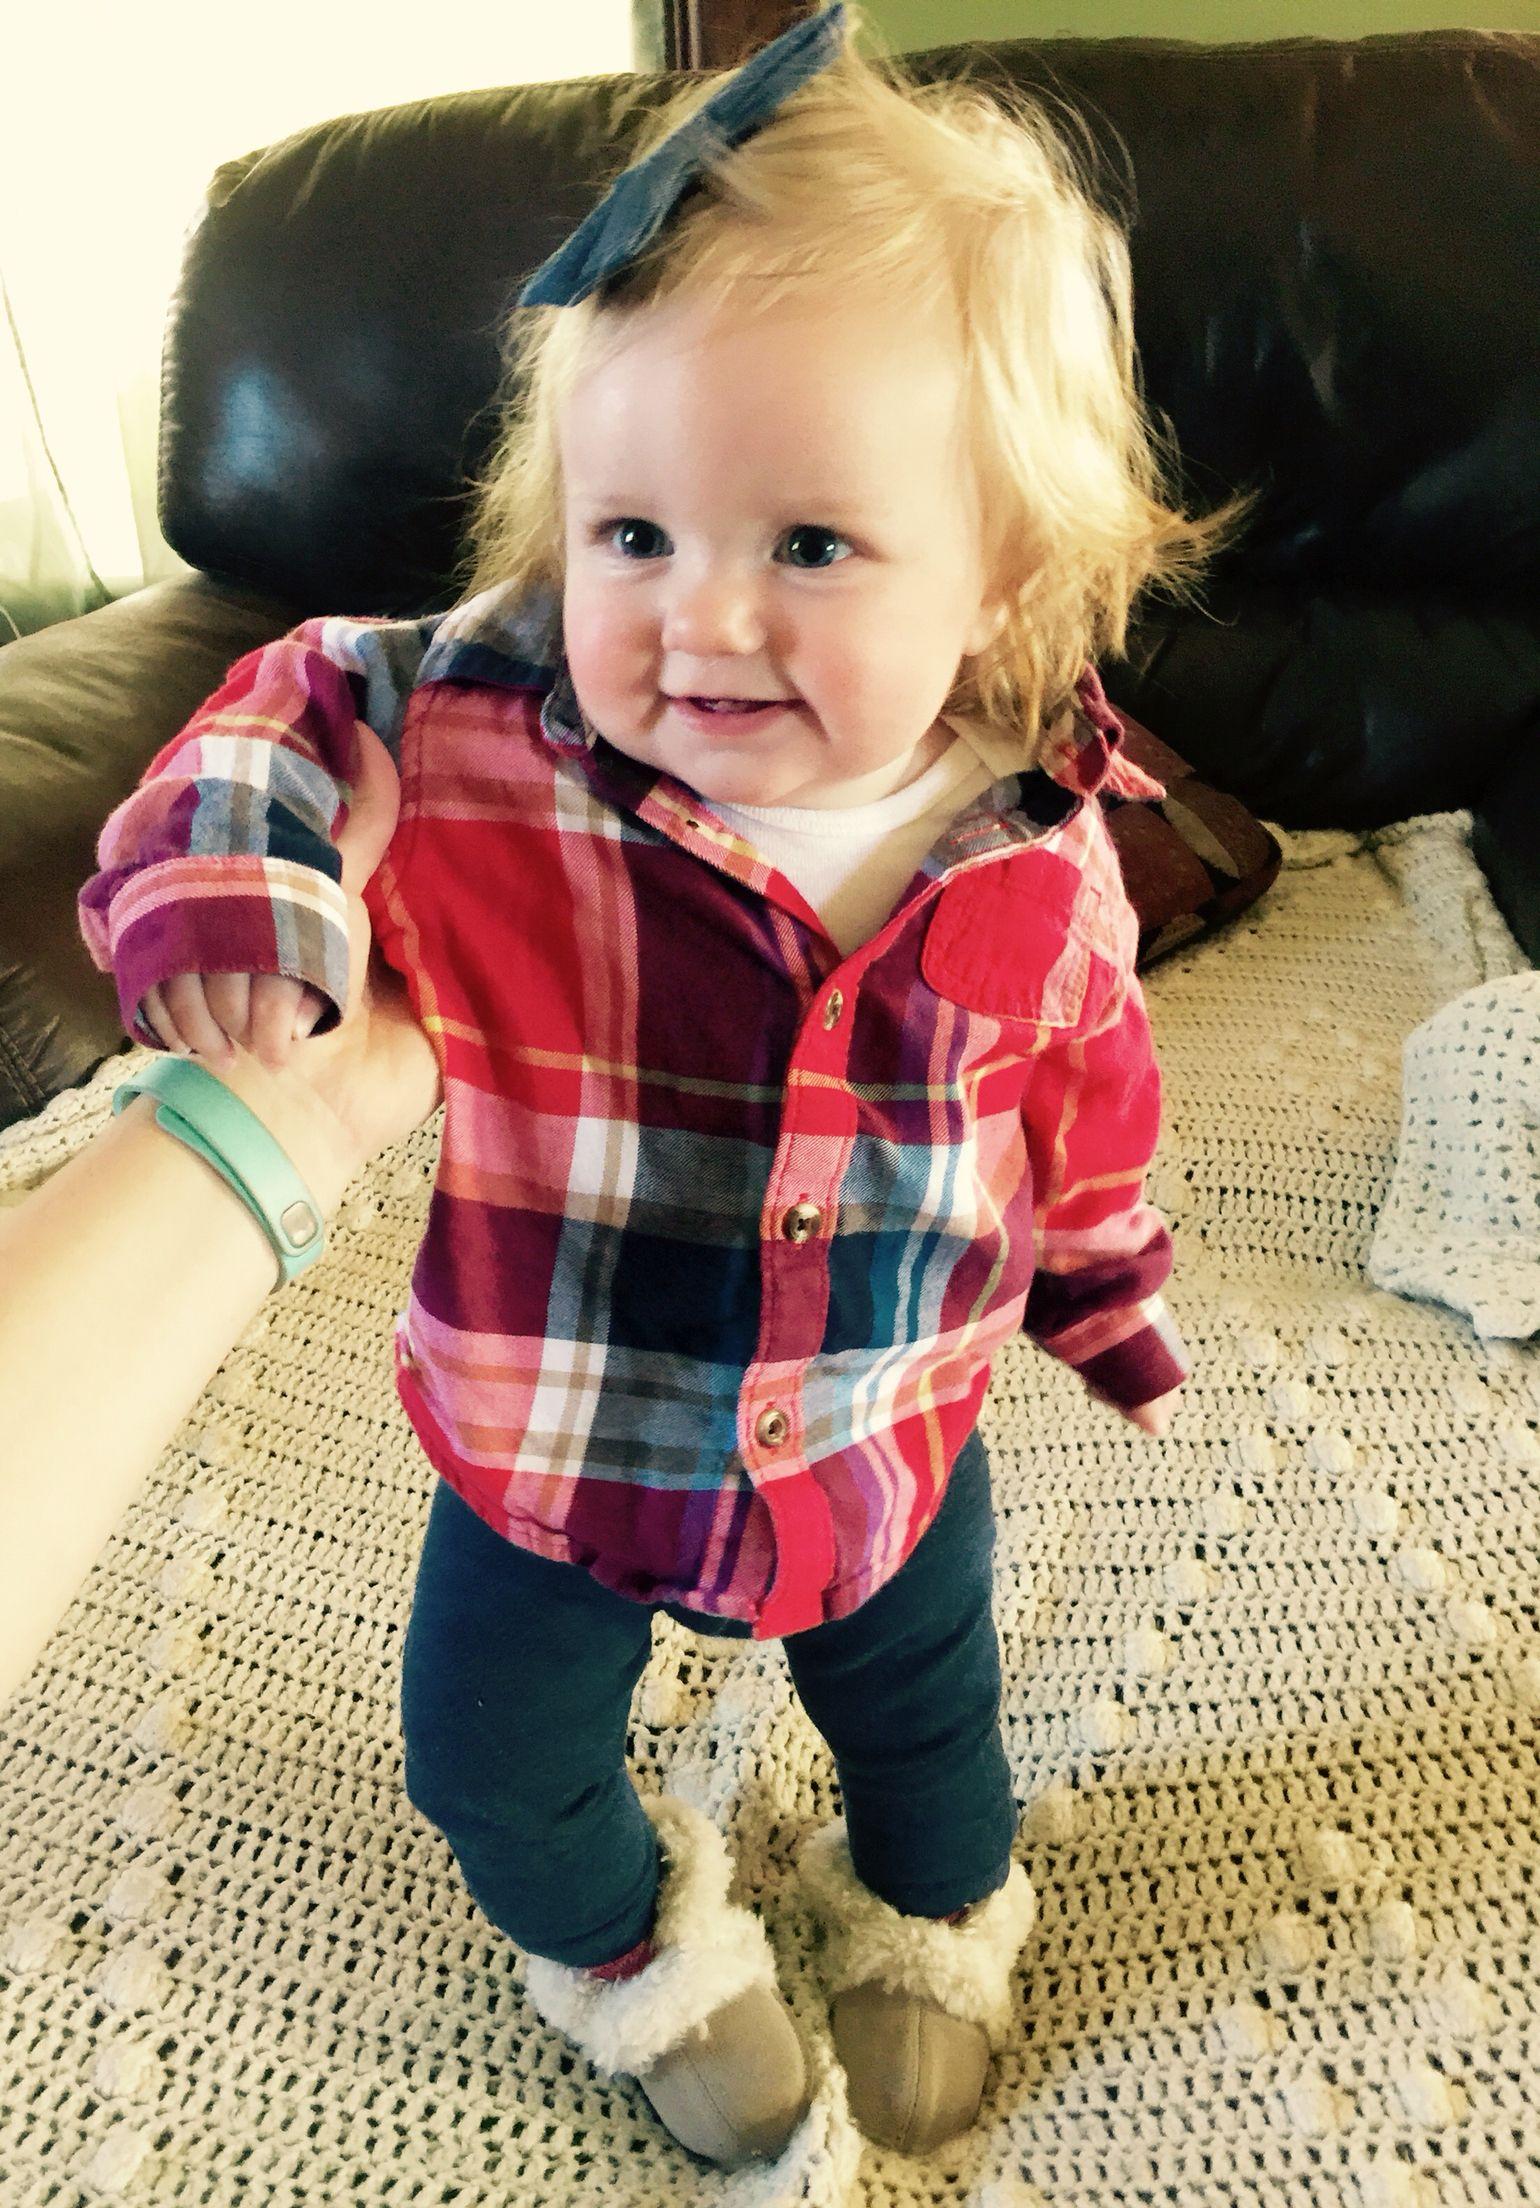 Baby hipster girl clothes idea photo catalog photo